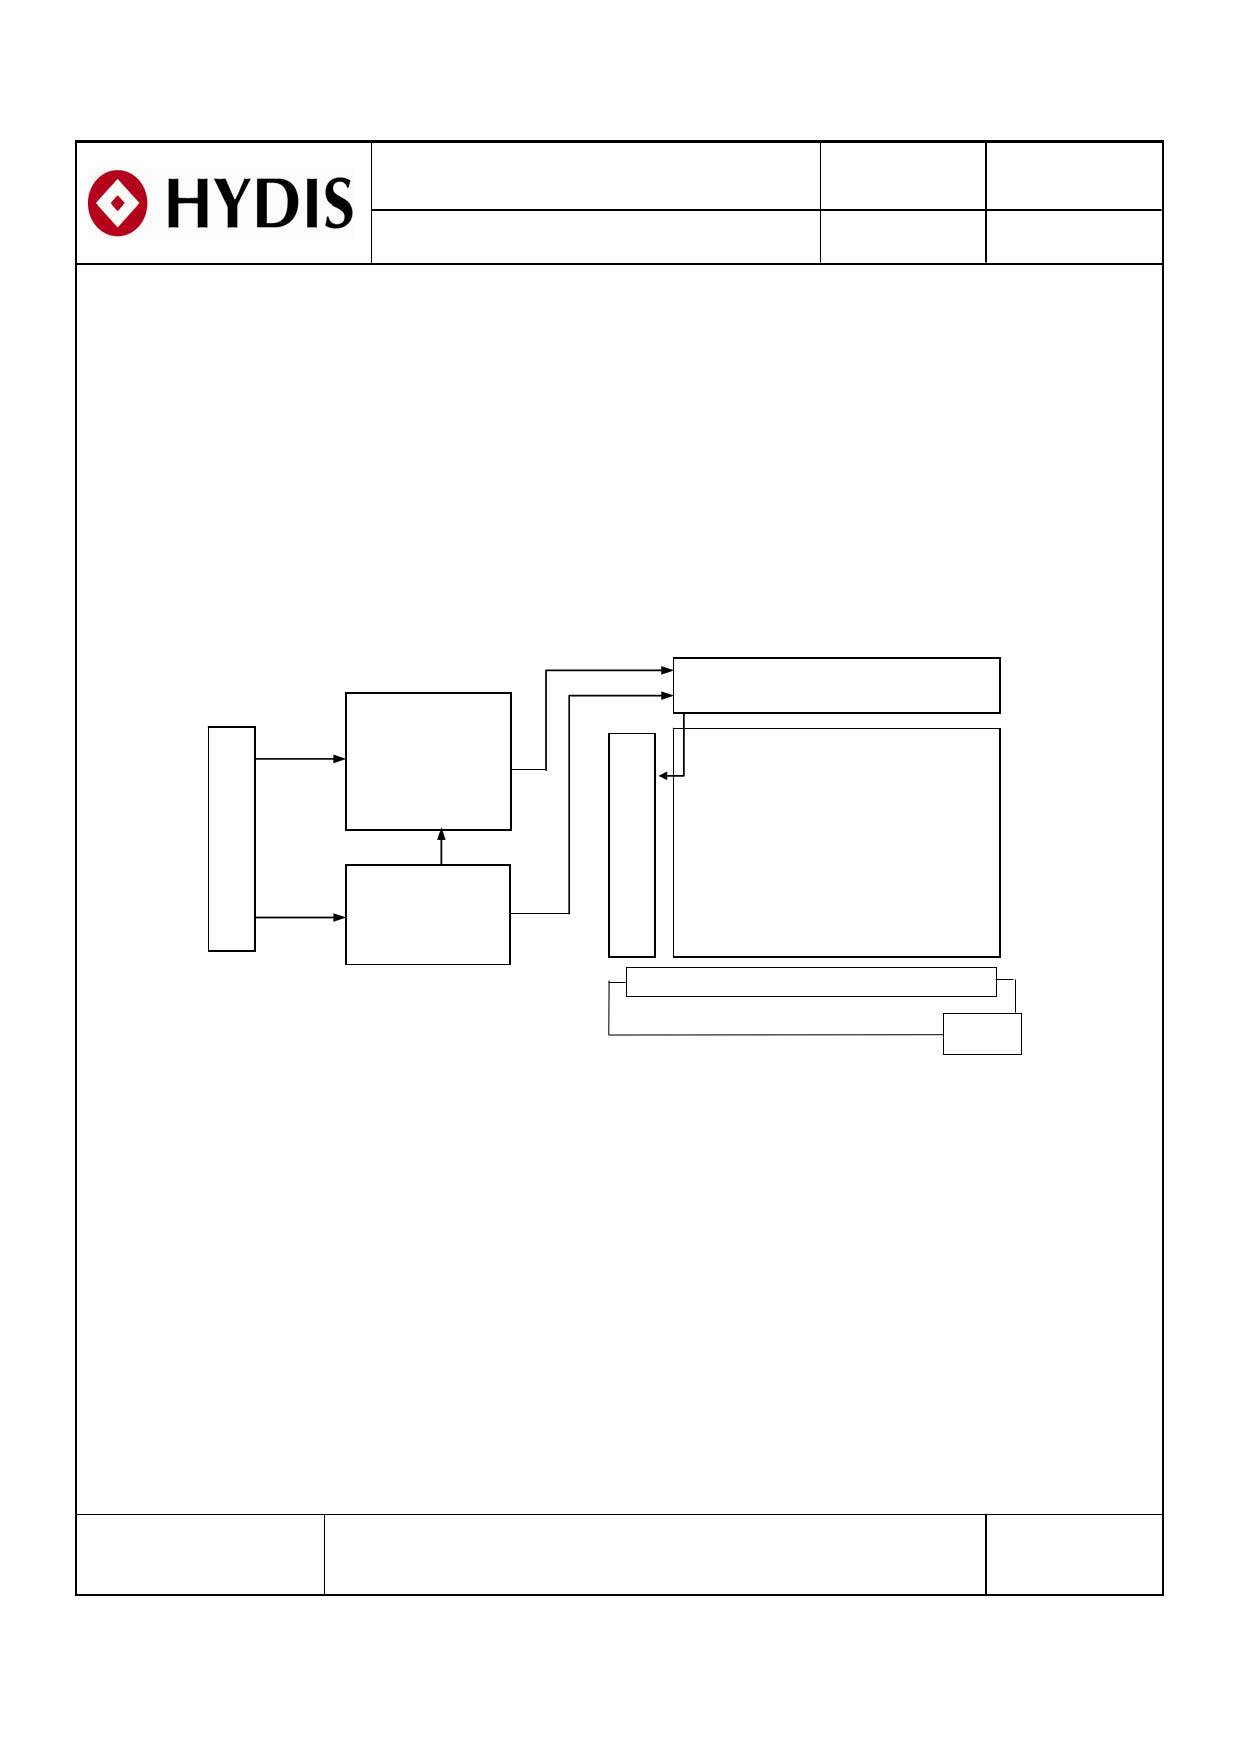 HV121WX4-120 pdf, ピン配列